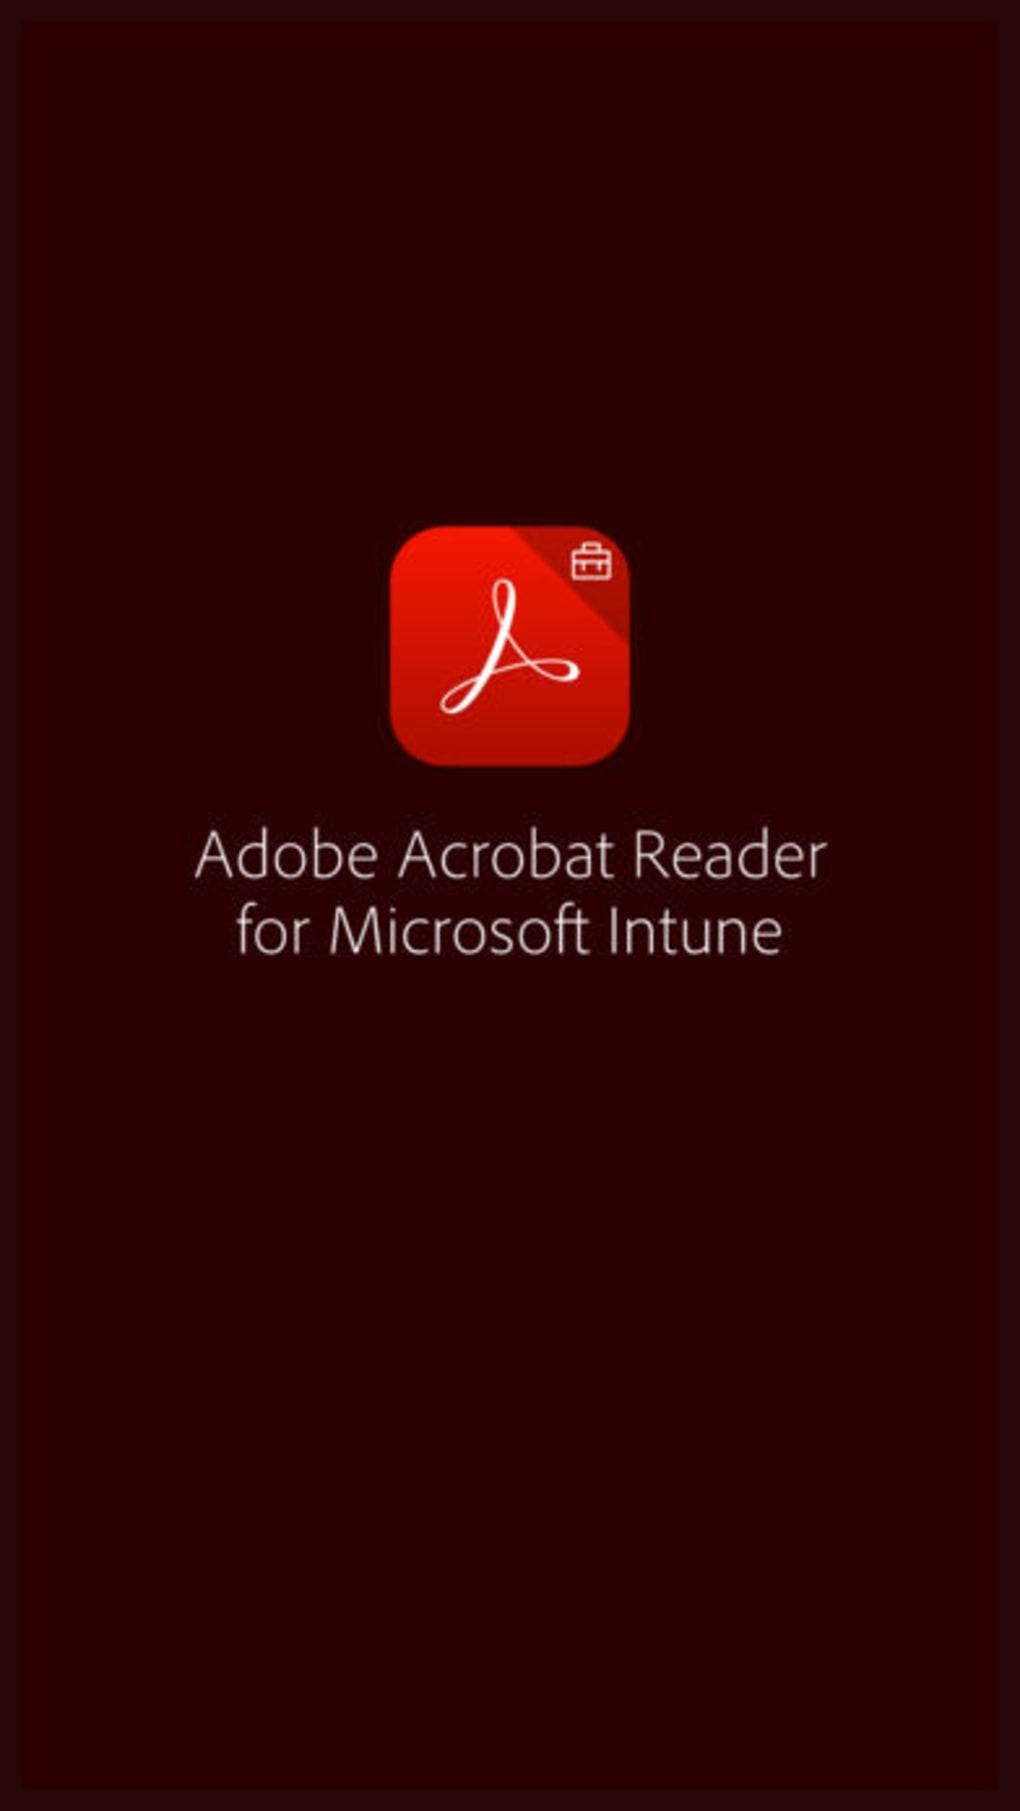 Adobe Acrobat Reader Intune for iPhone - Download